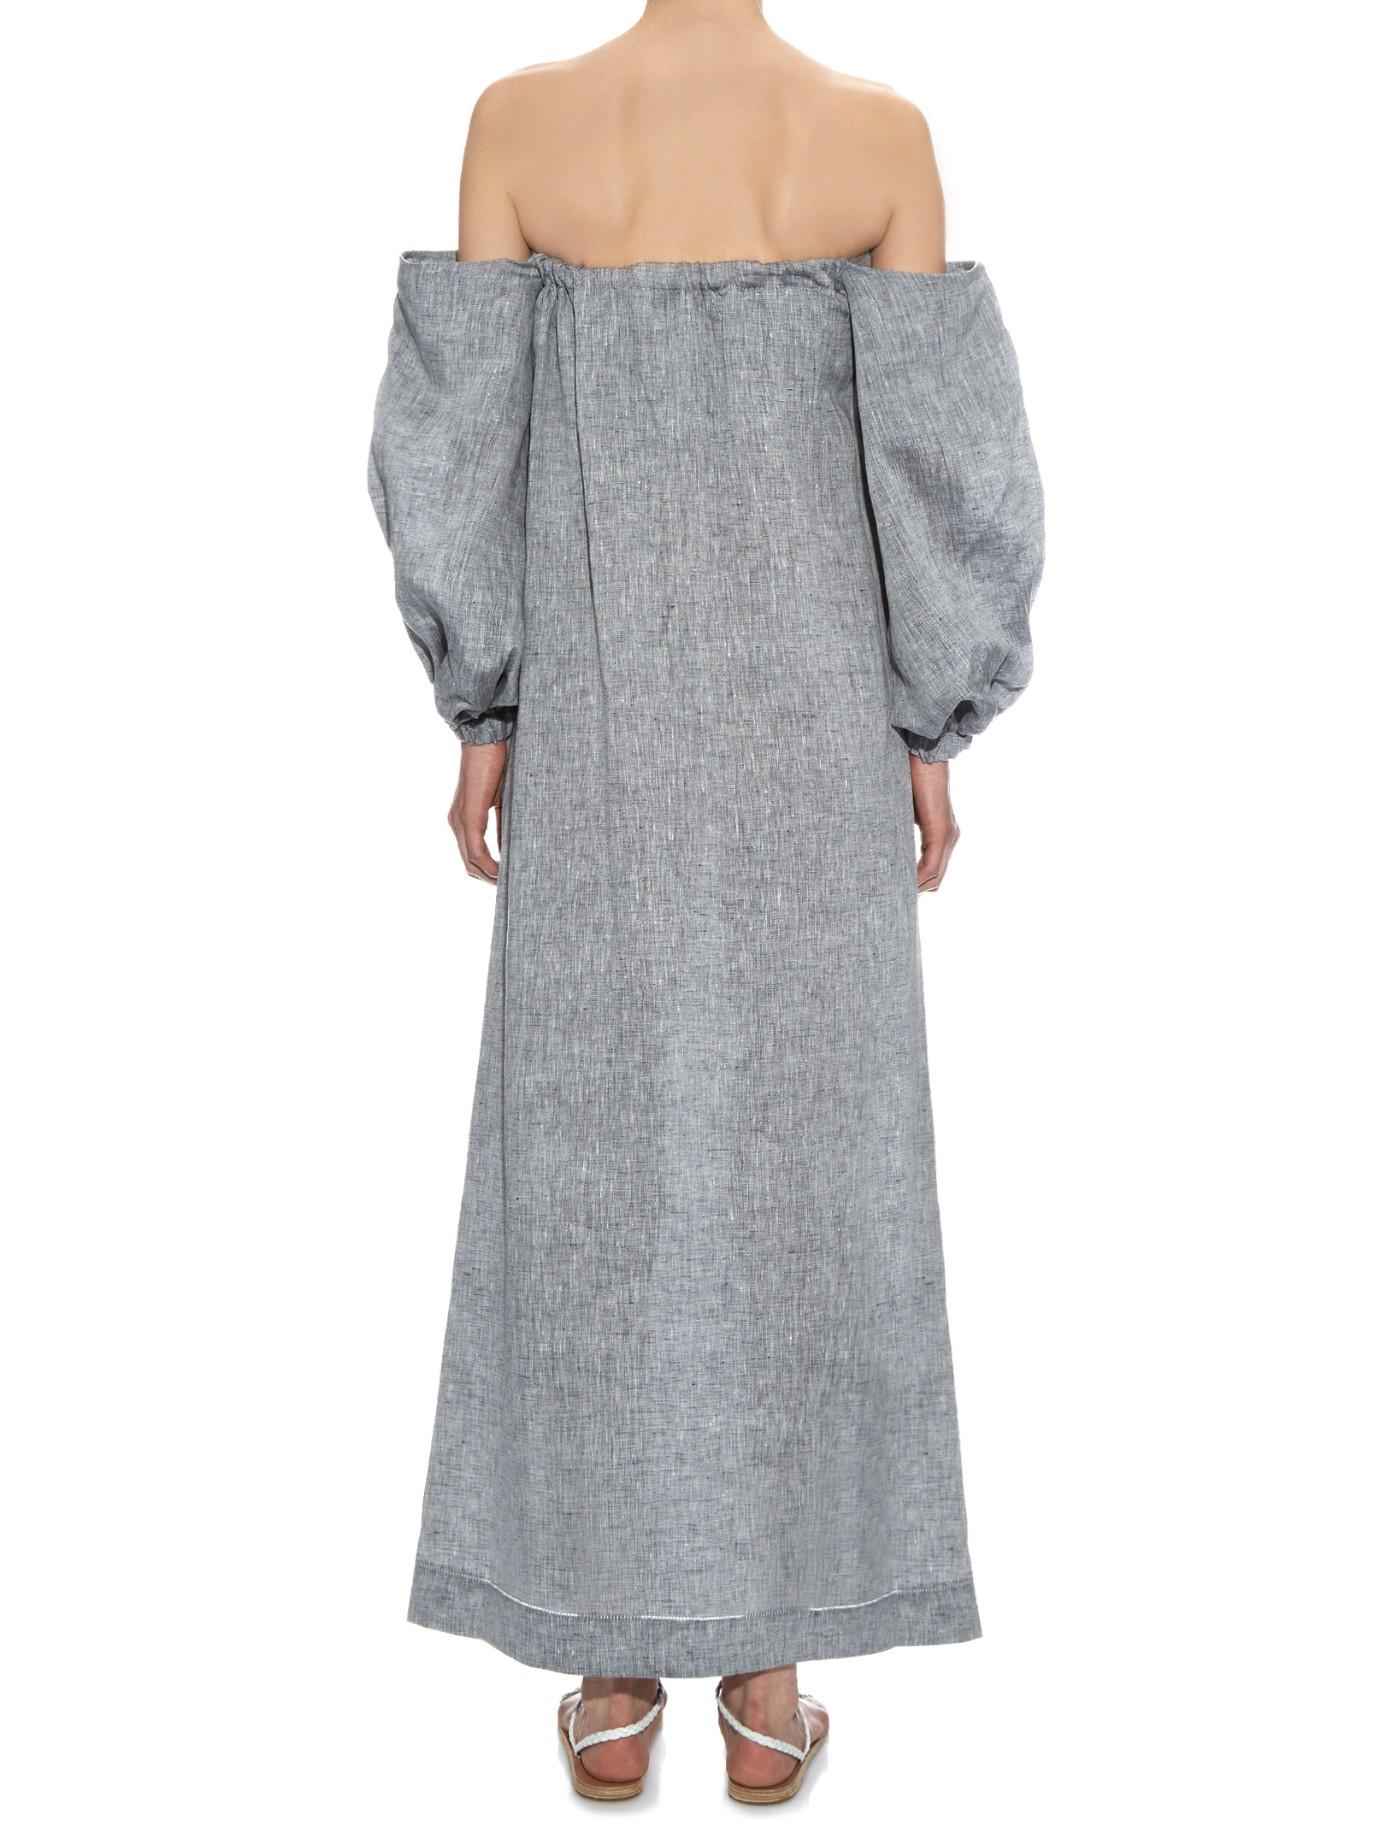 15f82c22cb Lyst - Lisa Marie Fernandez Rosie Off-the-shoulder Linen Dress in Gray